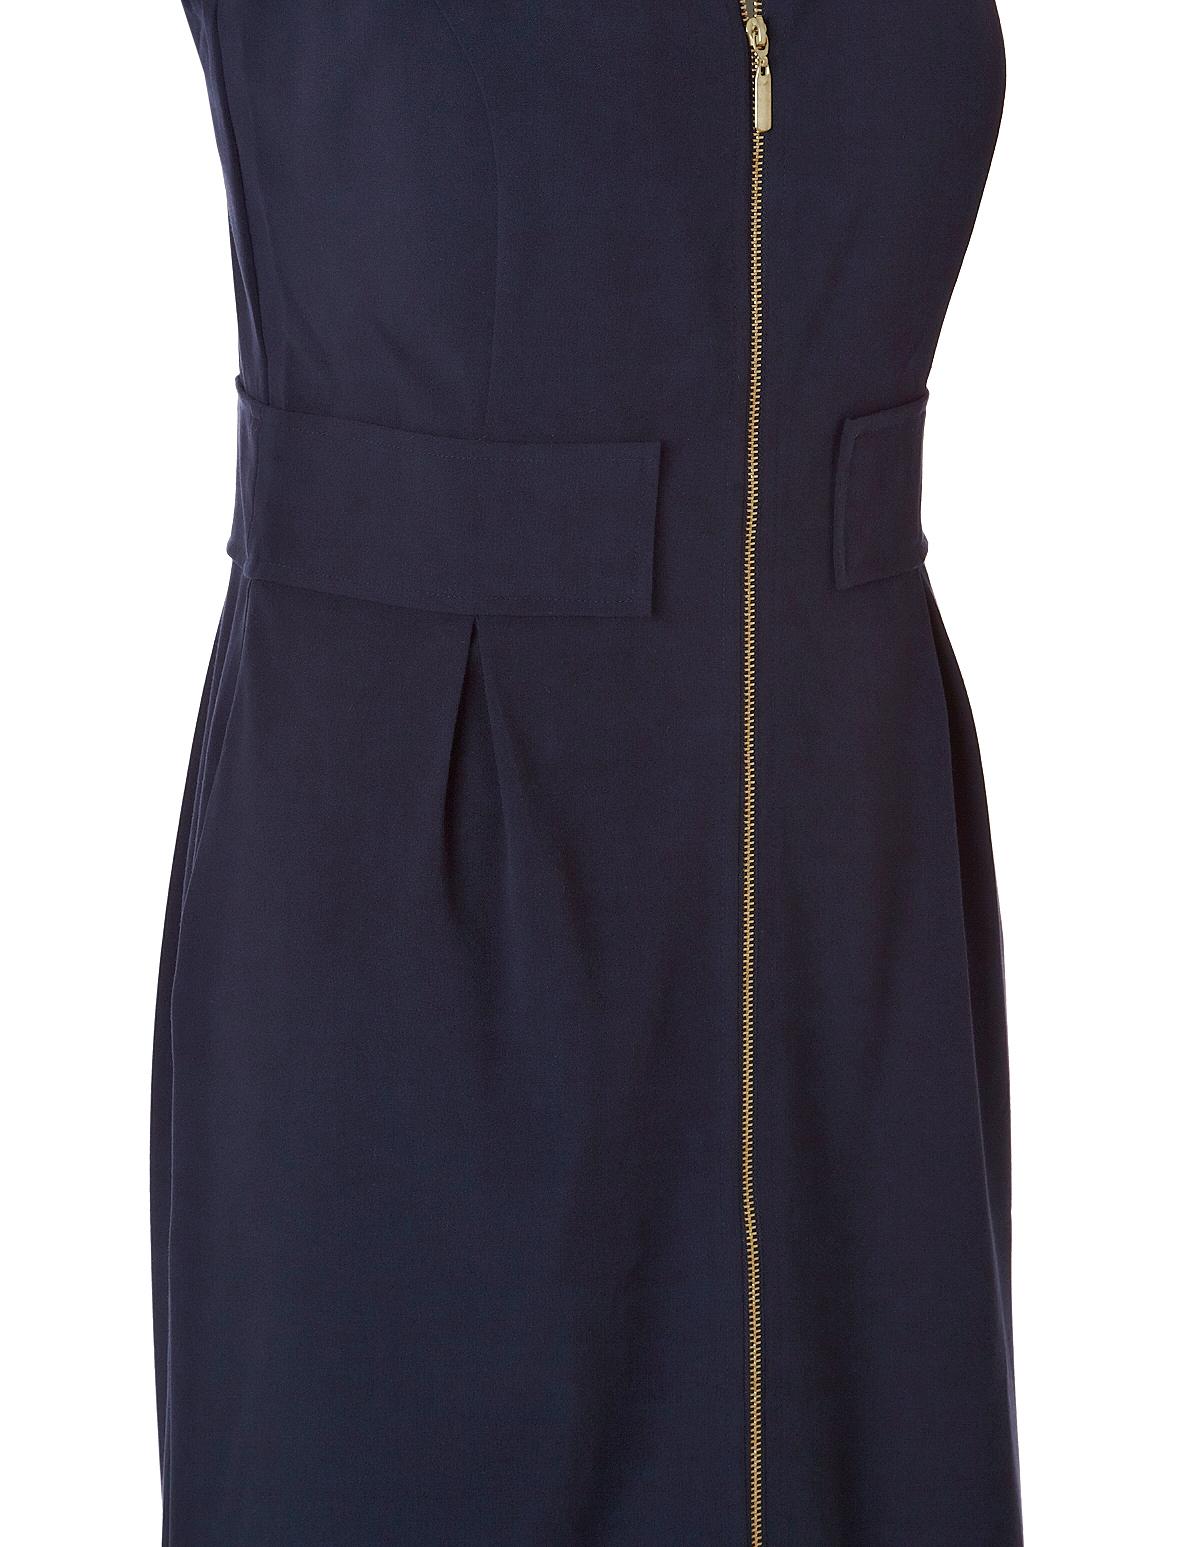 8d2931fd10dd ... Navy Zipper Front Shift Dress, Navy/Gold, hi-res ...